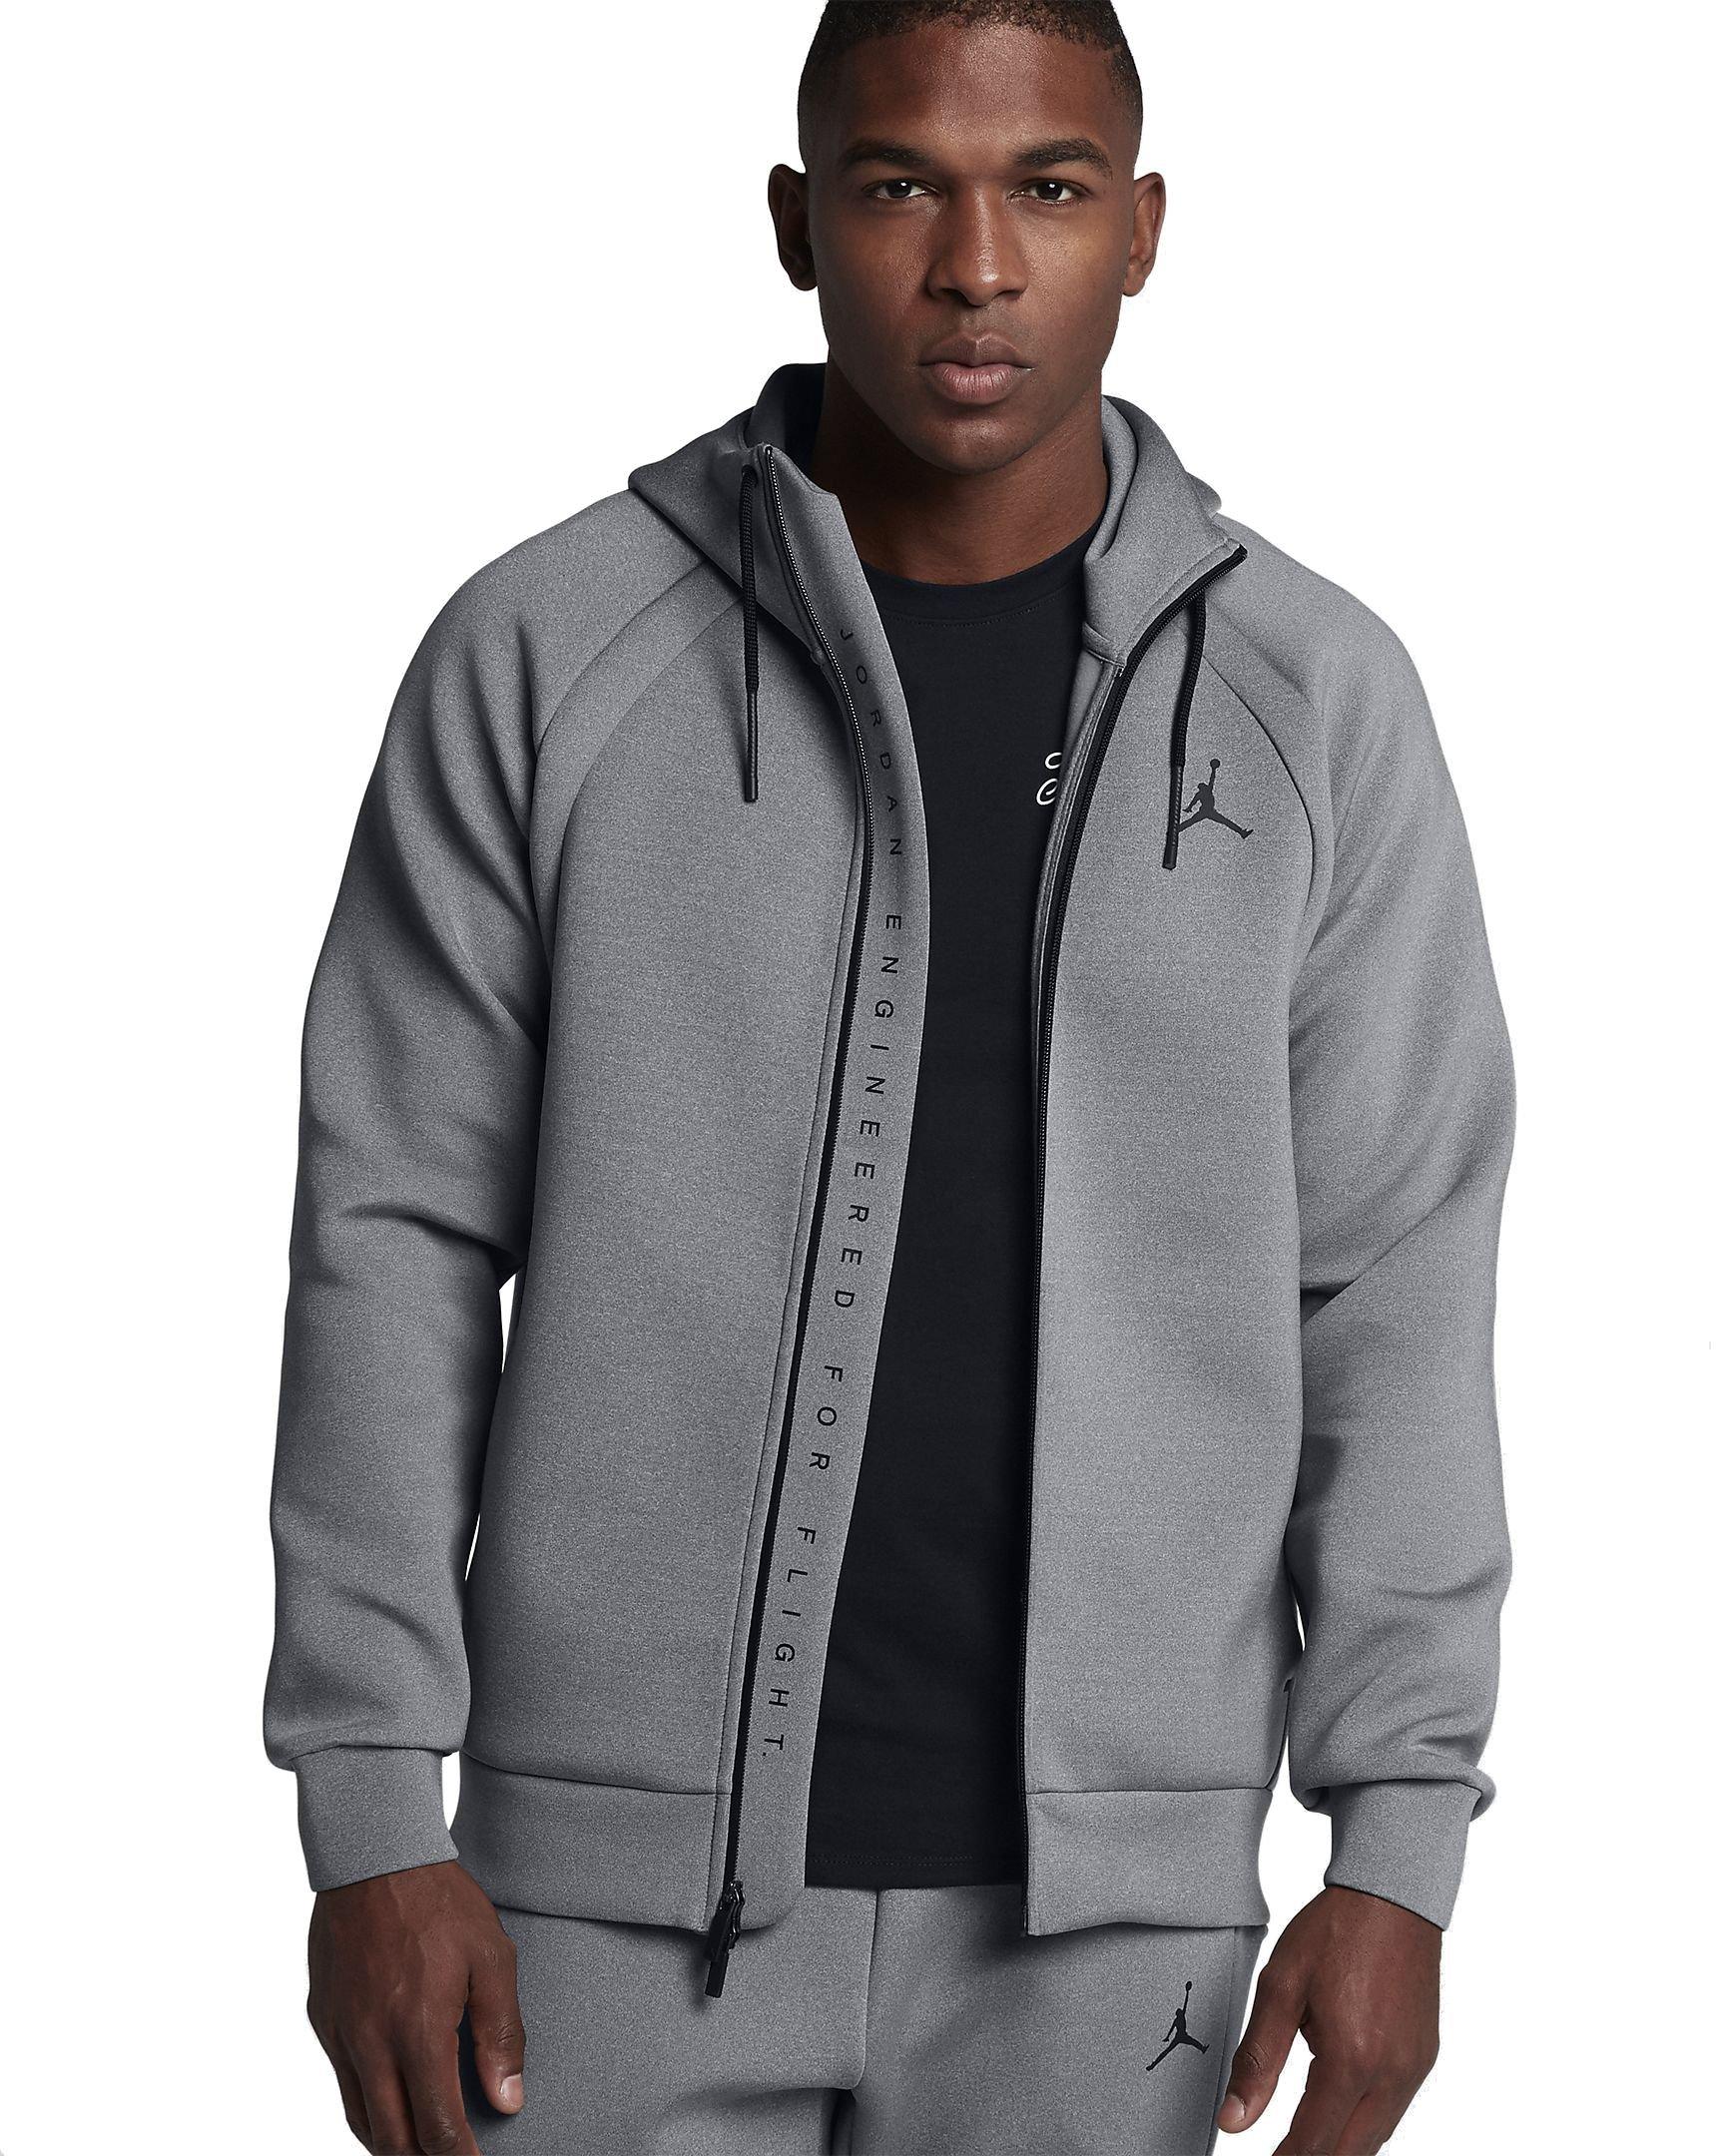 Nike Mens Jordan Flight Tech Fleece Full-Zip Hoodie - Carbon Heather/Black (Large)